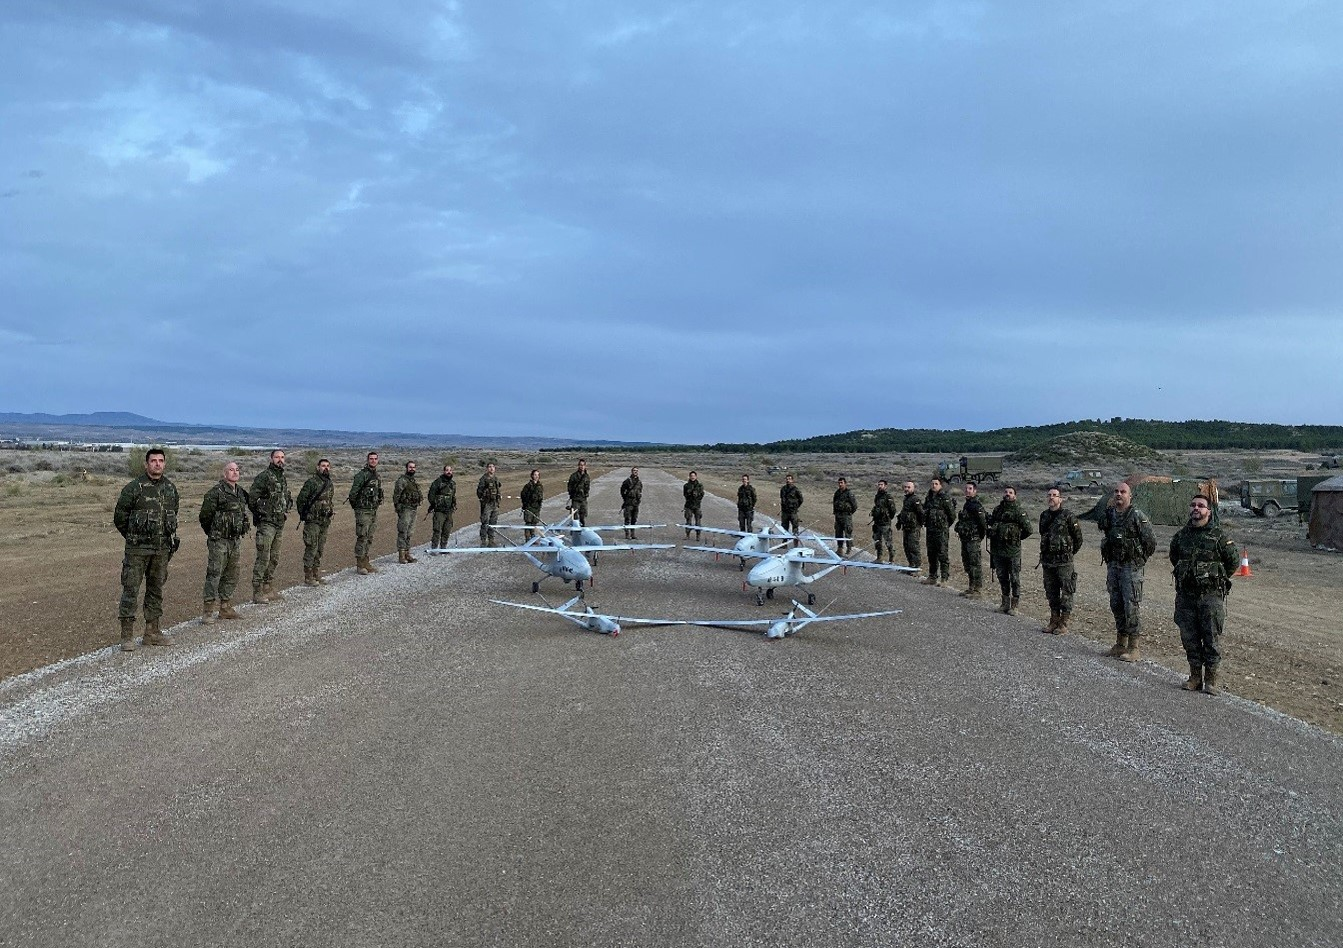 uas-atlantic-toro-exercise-2019-spanish-army